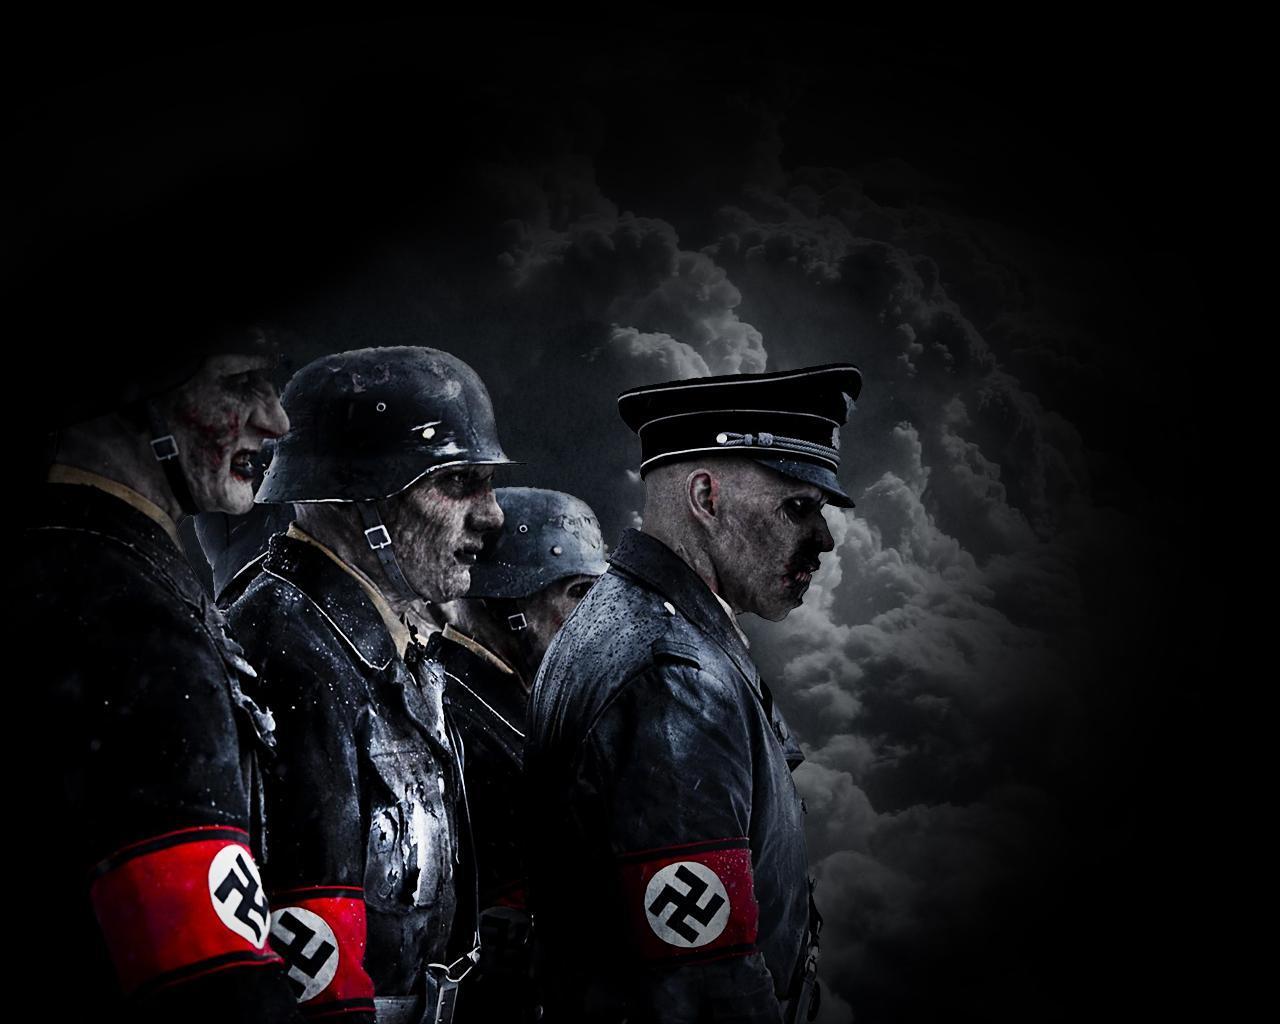 Boys nazi nazies fucking girls